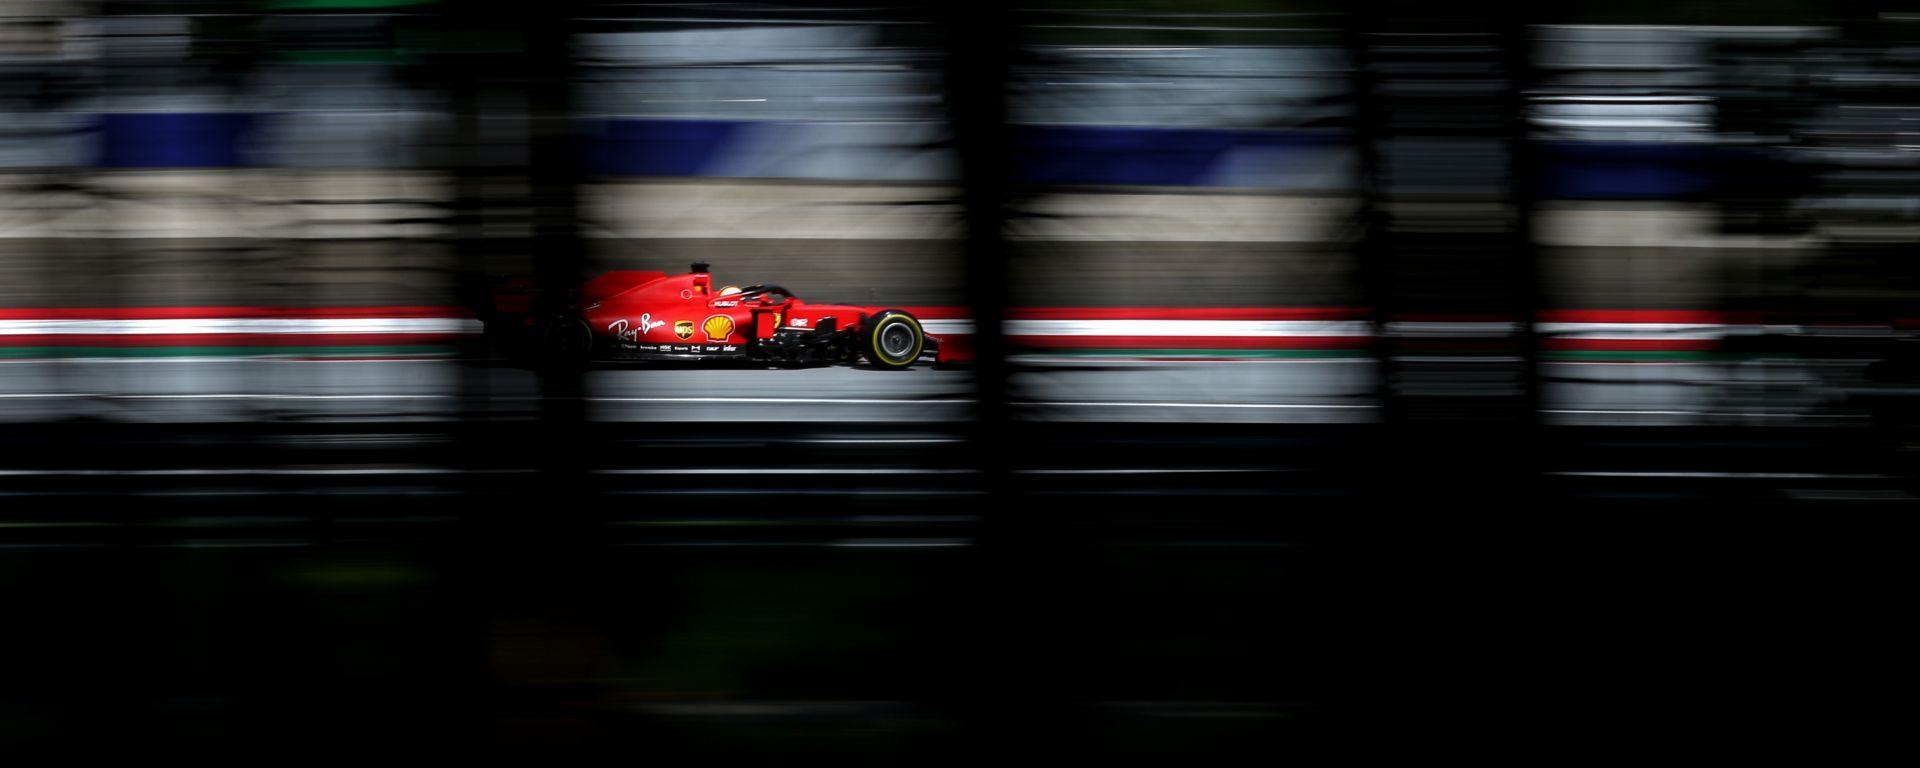 F1 GP Stiria 2020, Red Bull Ring: Sebastian Vettel (Ferrari) sfreccia in pista